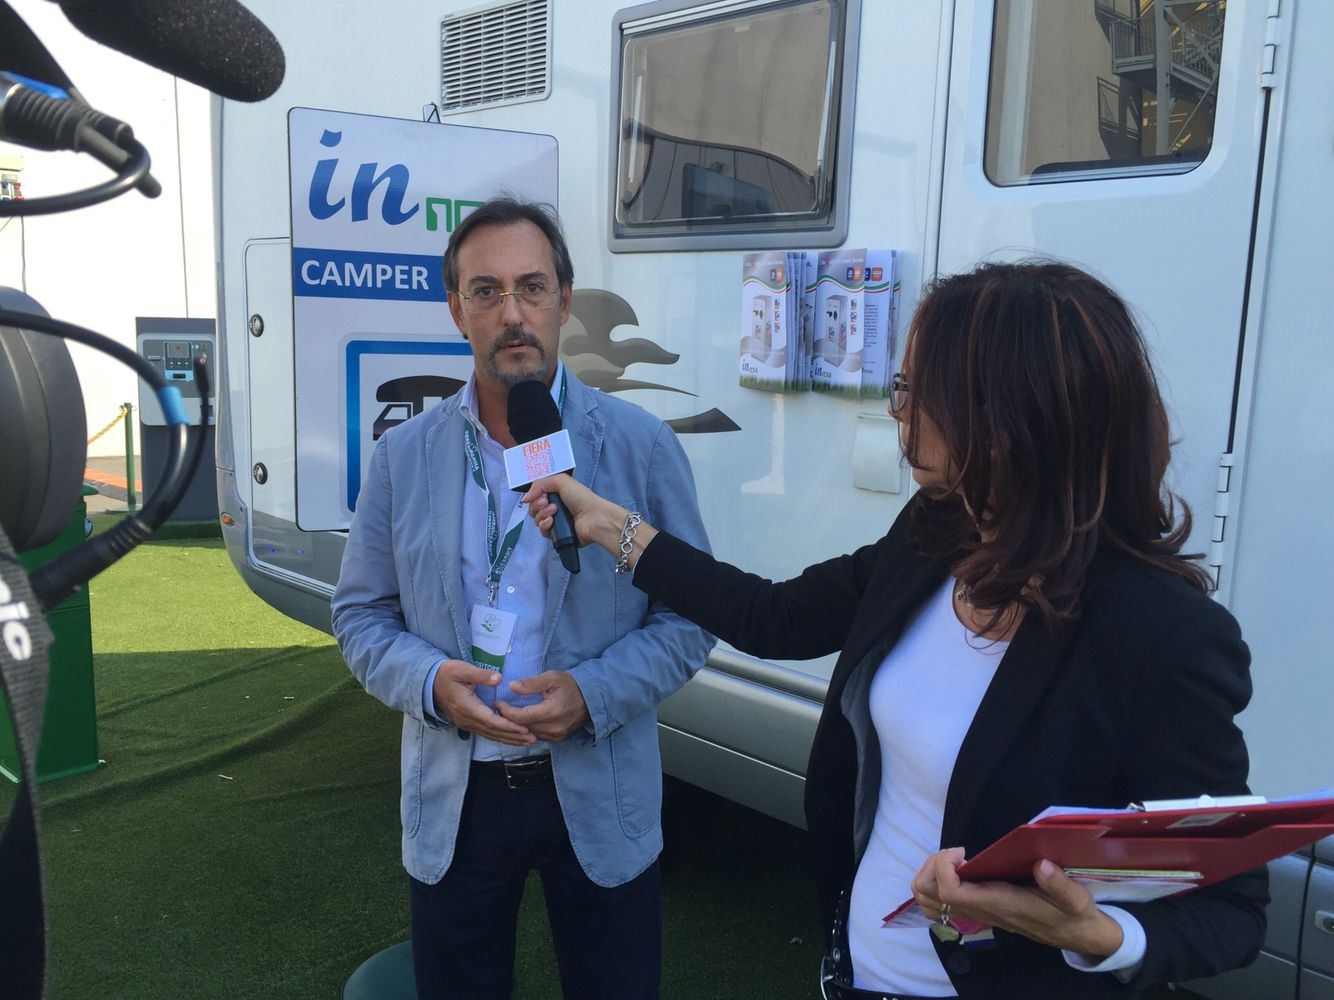 Backstage intervista a Gianluca Tomellini - Camper Service by Innova